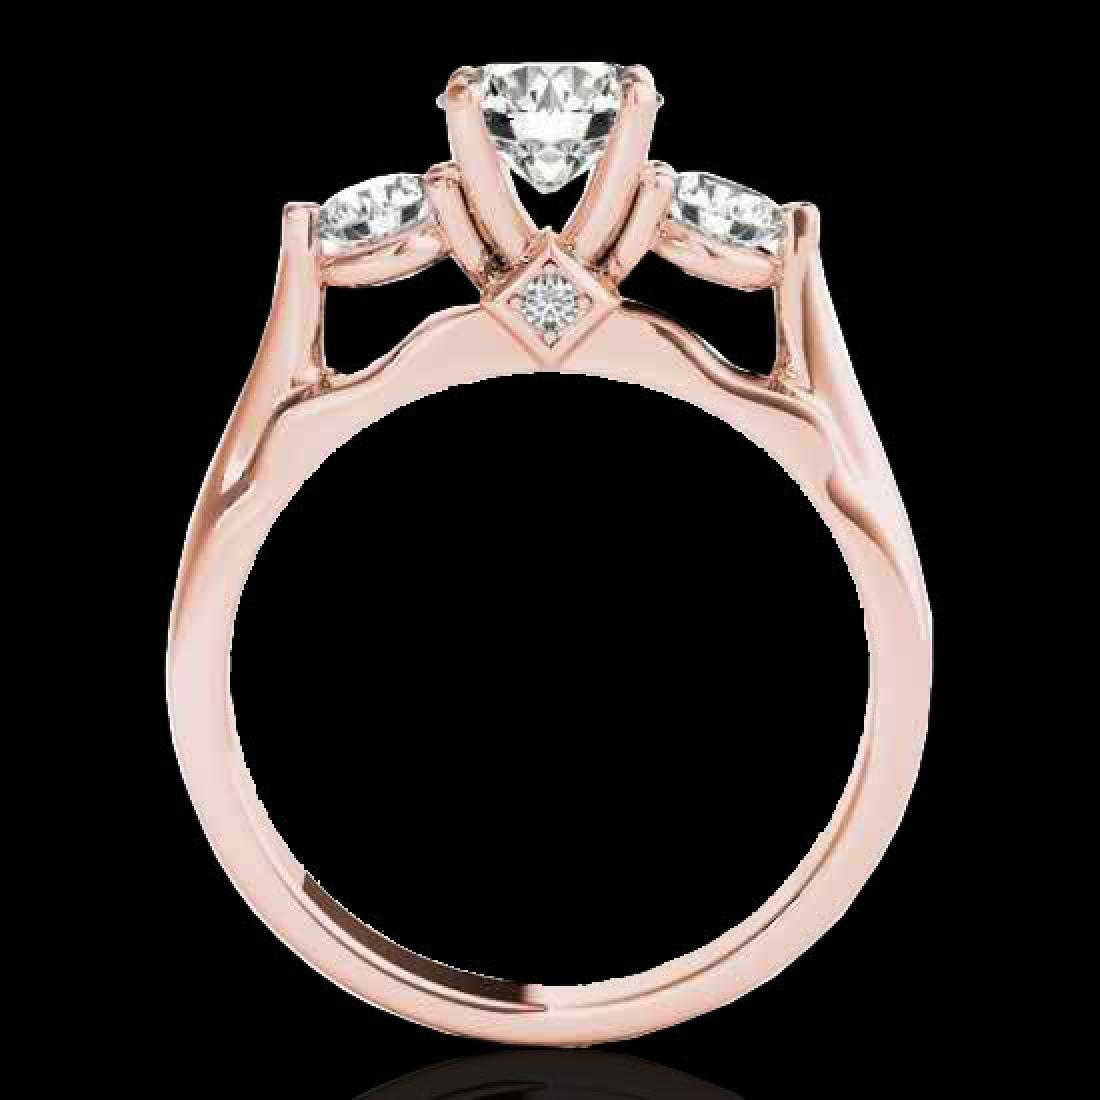 1.75 CTW H-SI/I Certified Diamond 3 Stone Ring 10K Rose - 2